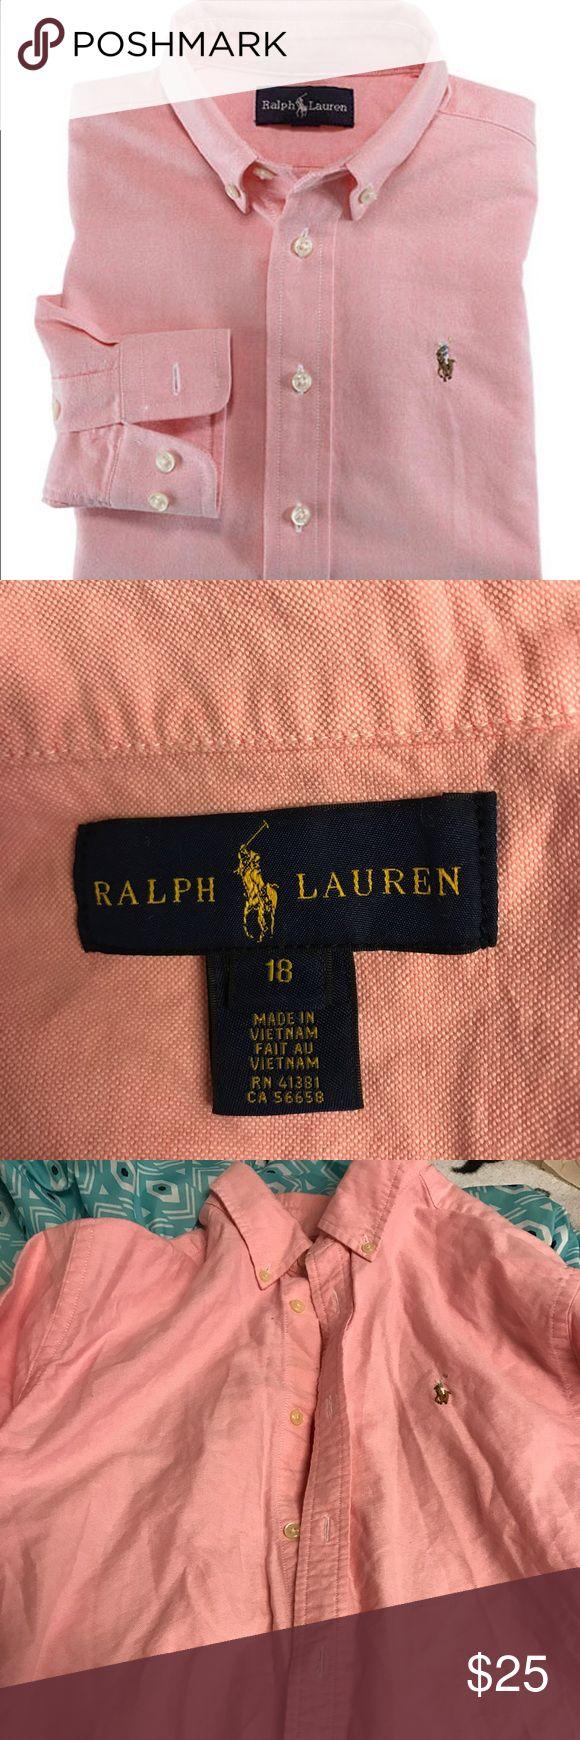 Ralph Lauren Oxford Shirt Pink . Worn Twice . Size 18 Big Boys . Too Big For Me . Ralph Lauren Shirts & Tops Button Down Shirts